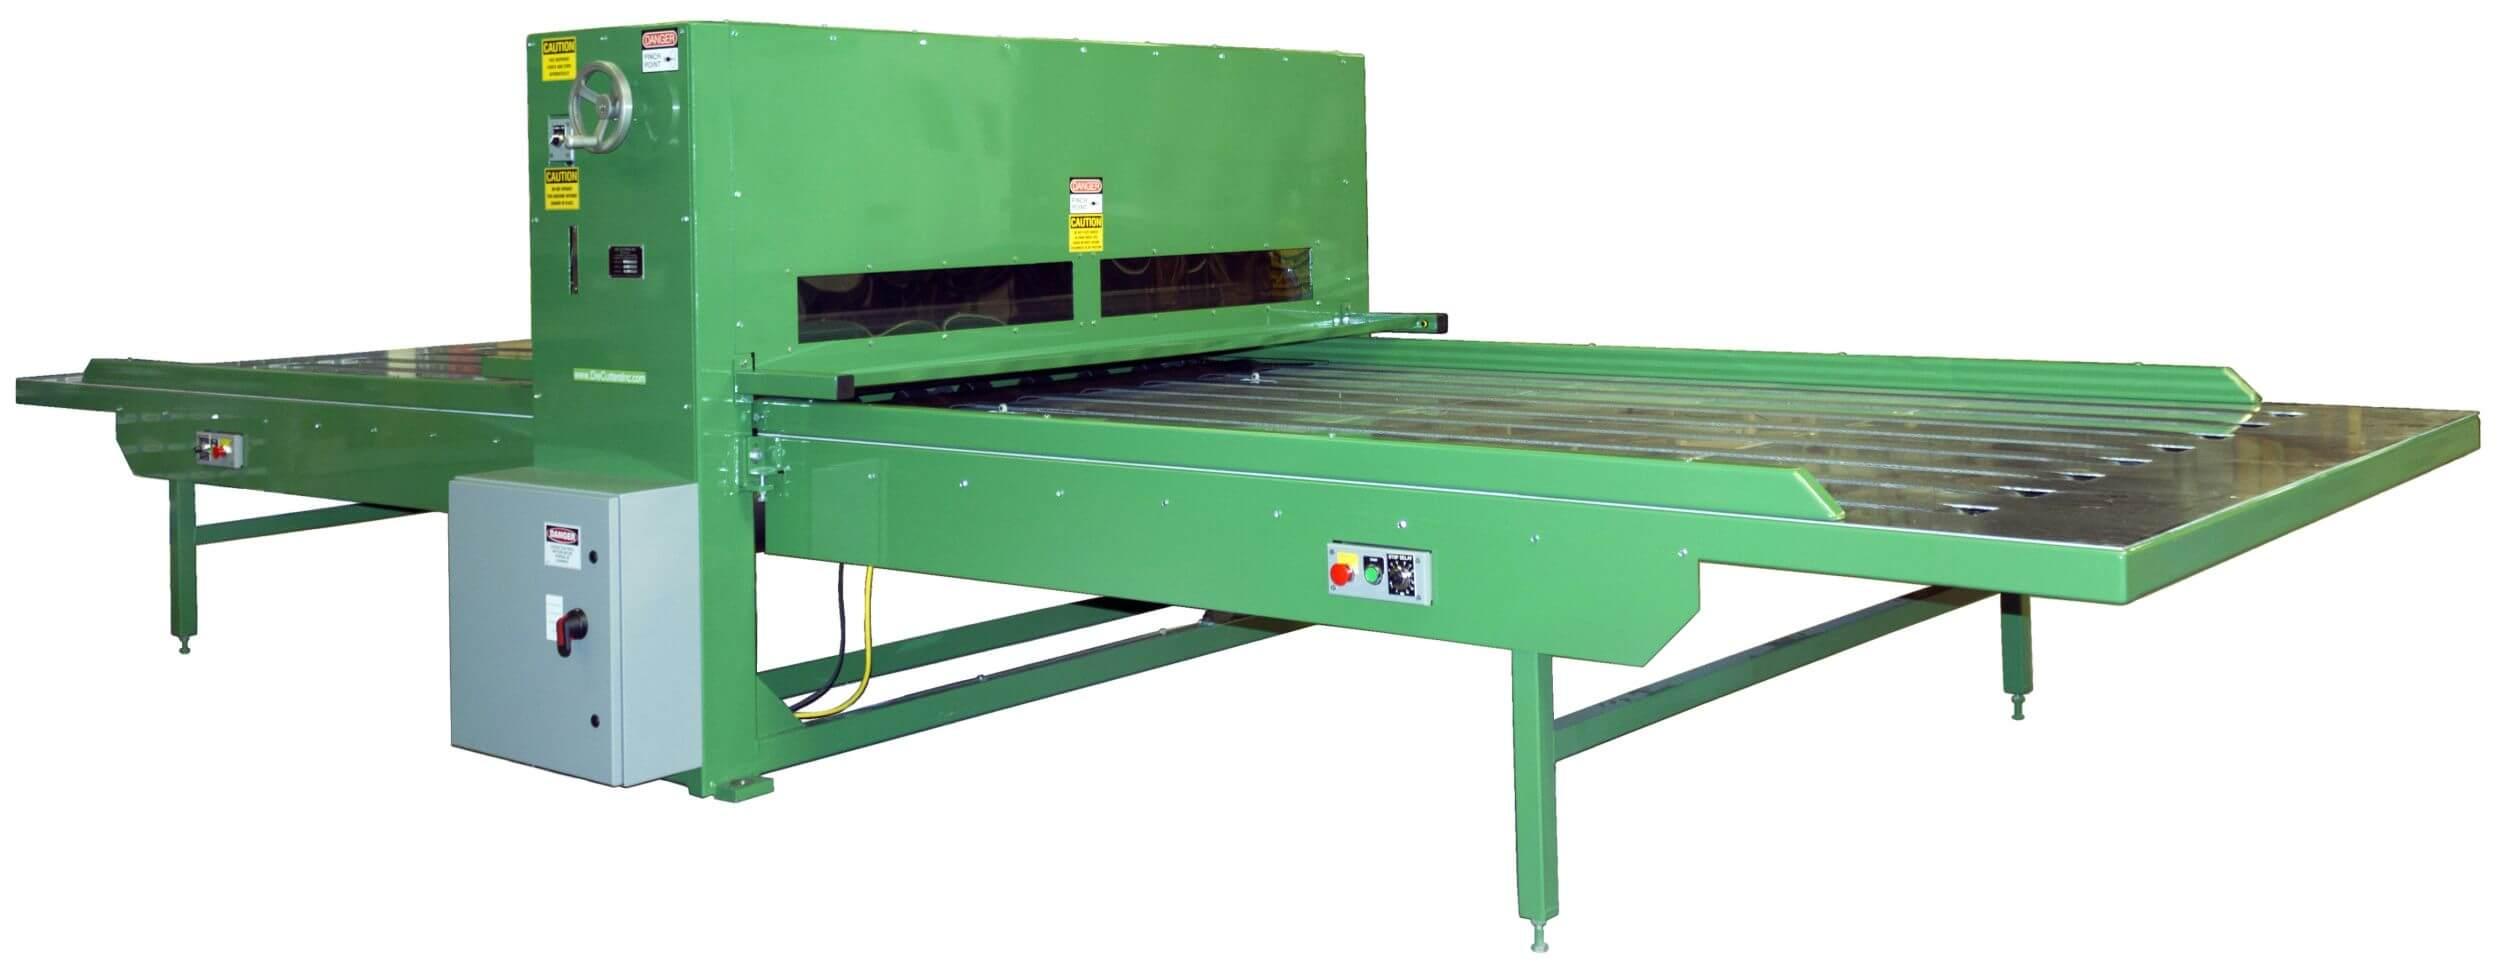 Cleen Cut 60 80 105 Roller Press Die Cutters